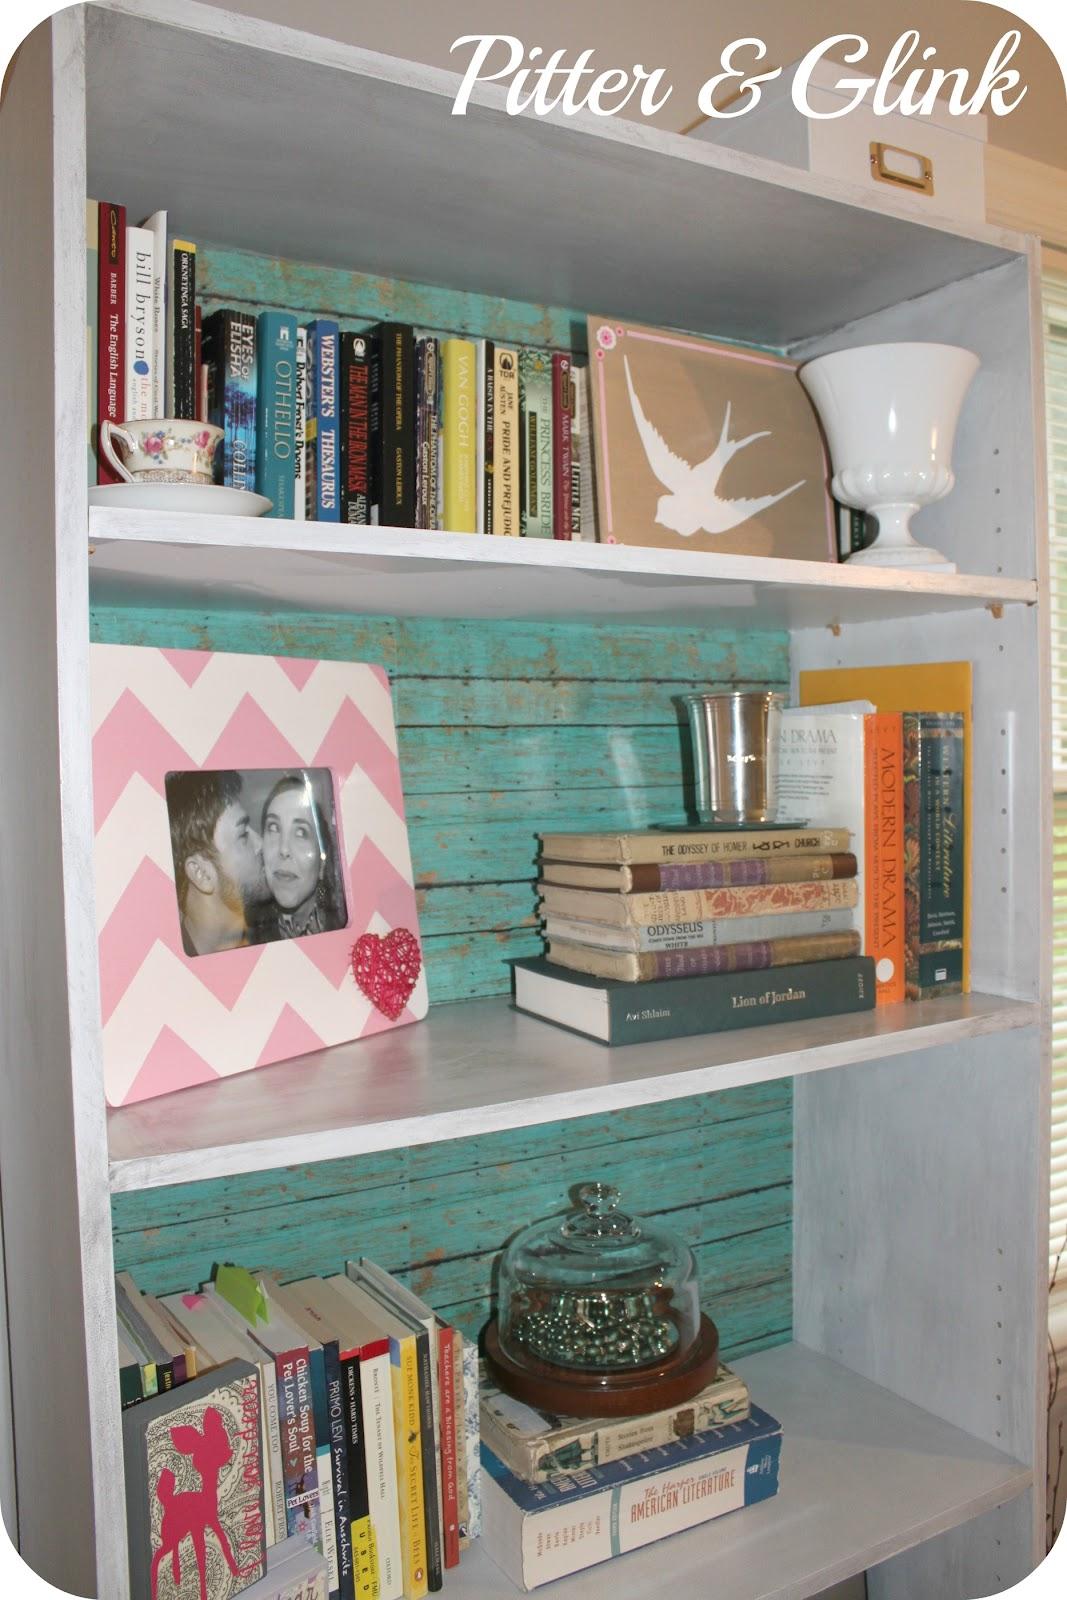 Pitterandglink Craft Room Redo Laminate Bookcase Revived